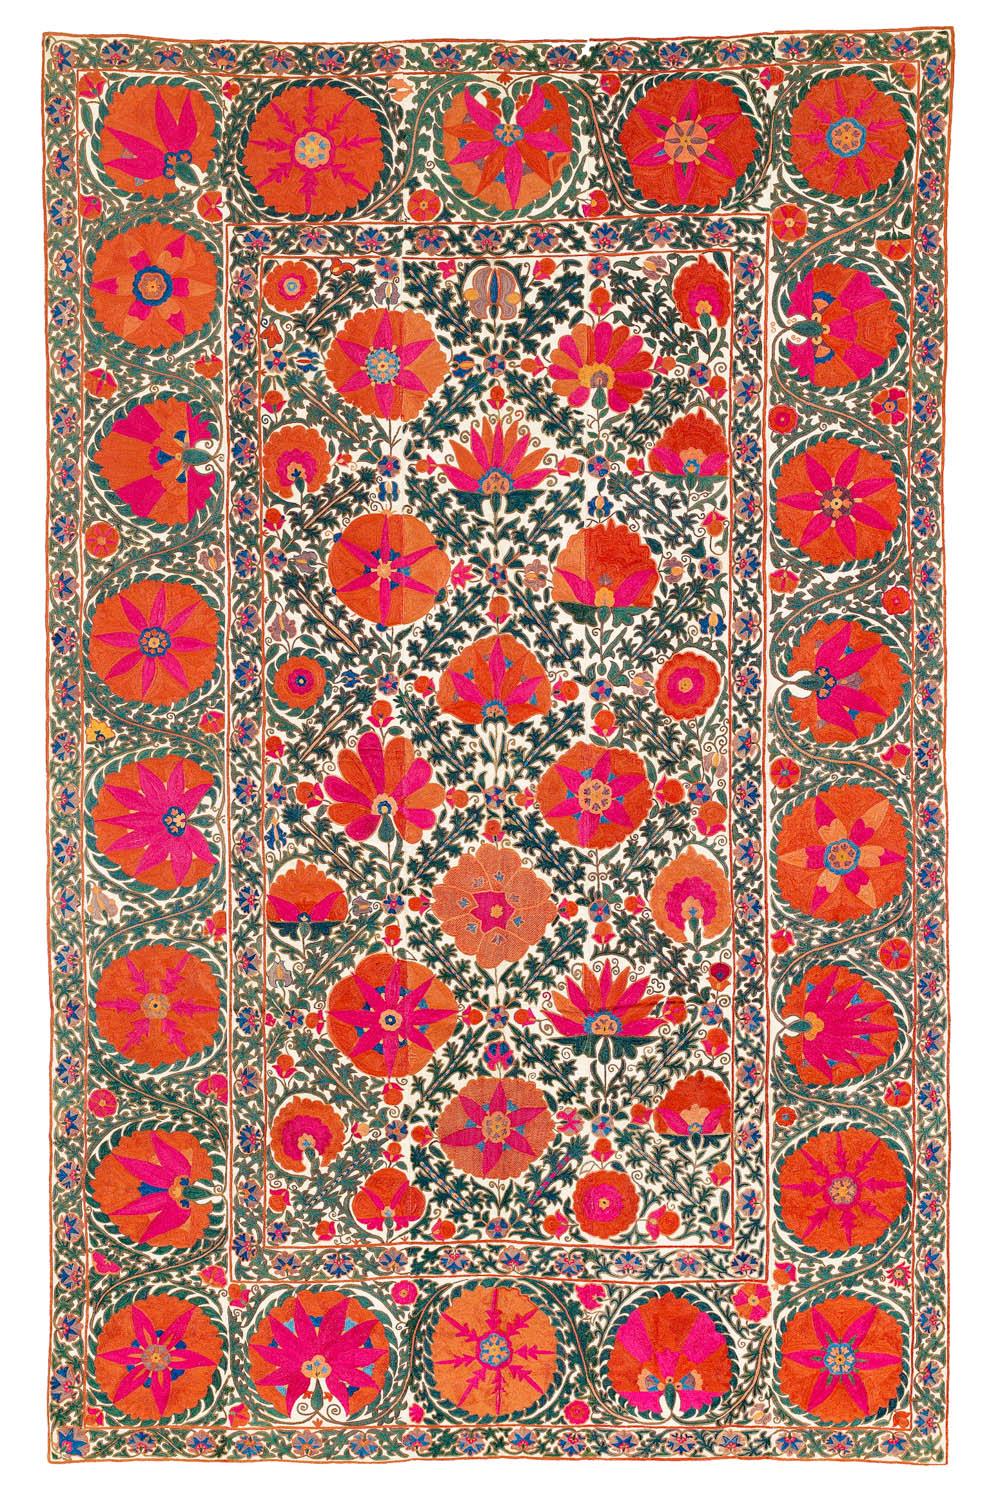 Lot 79, Kermina Suzani, Uzbekistan, 241 x 155 cm, estimate €14,500, sold for €15,860 ($19,510)